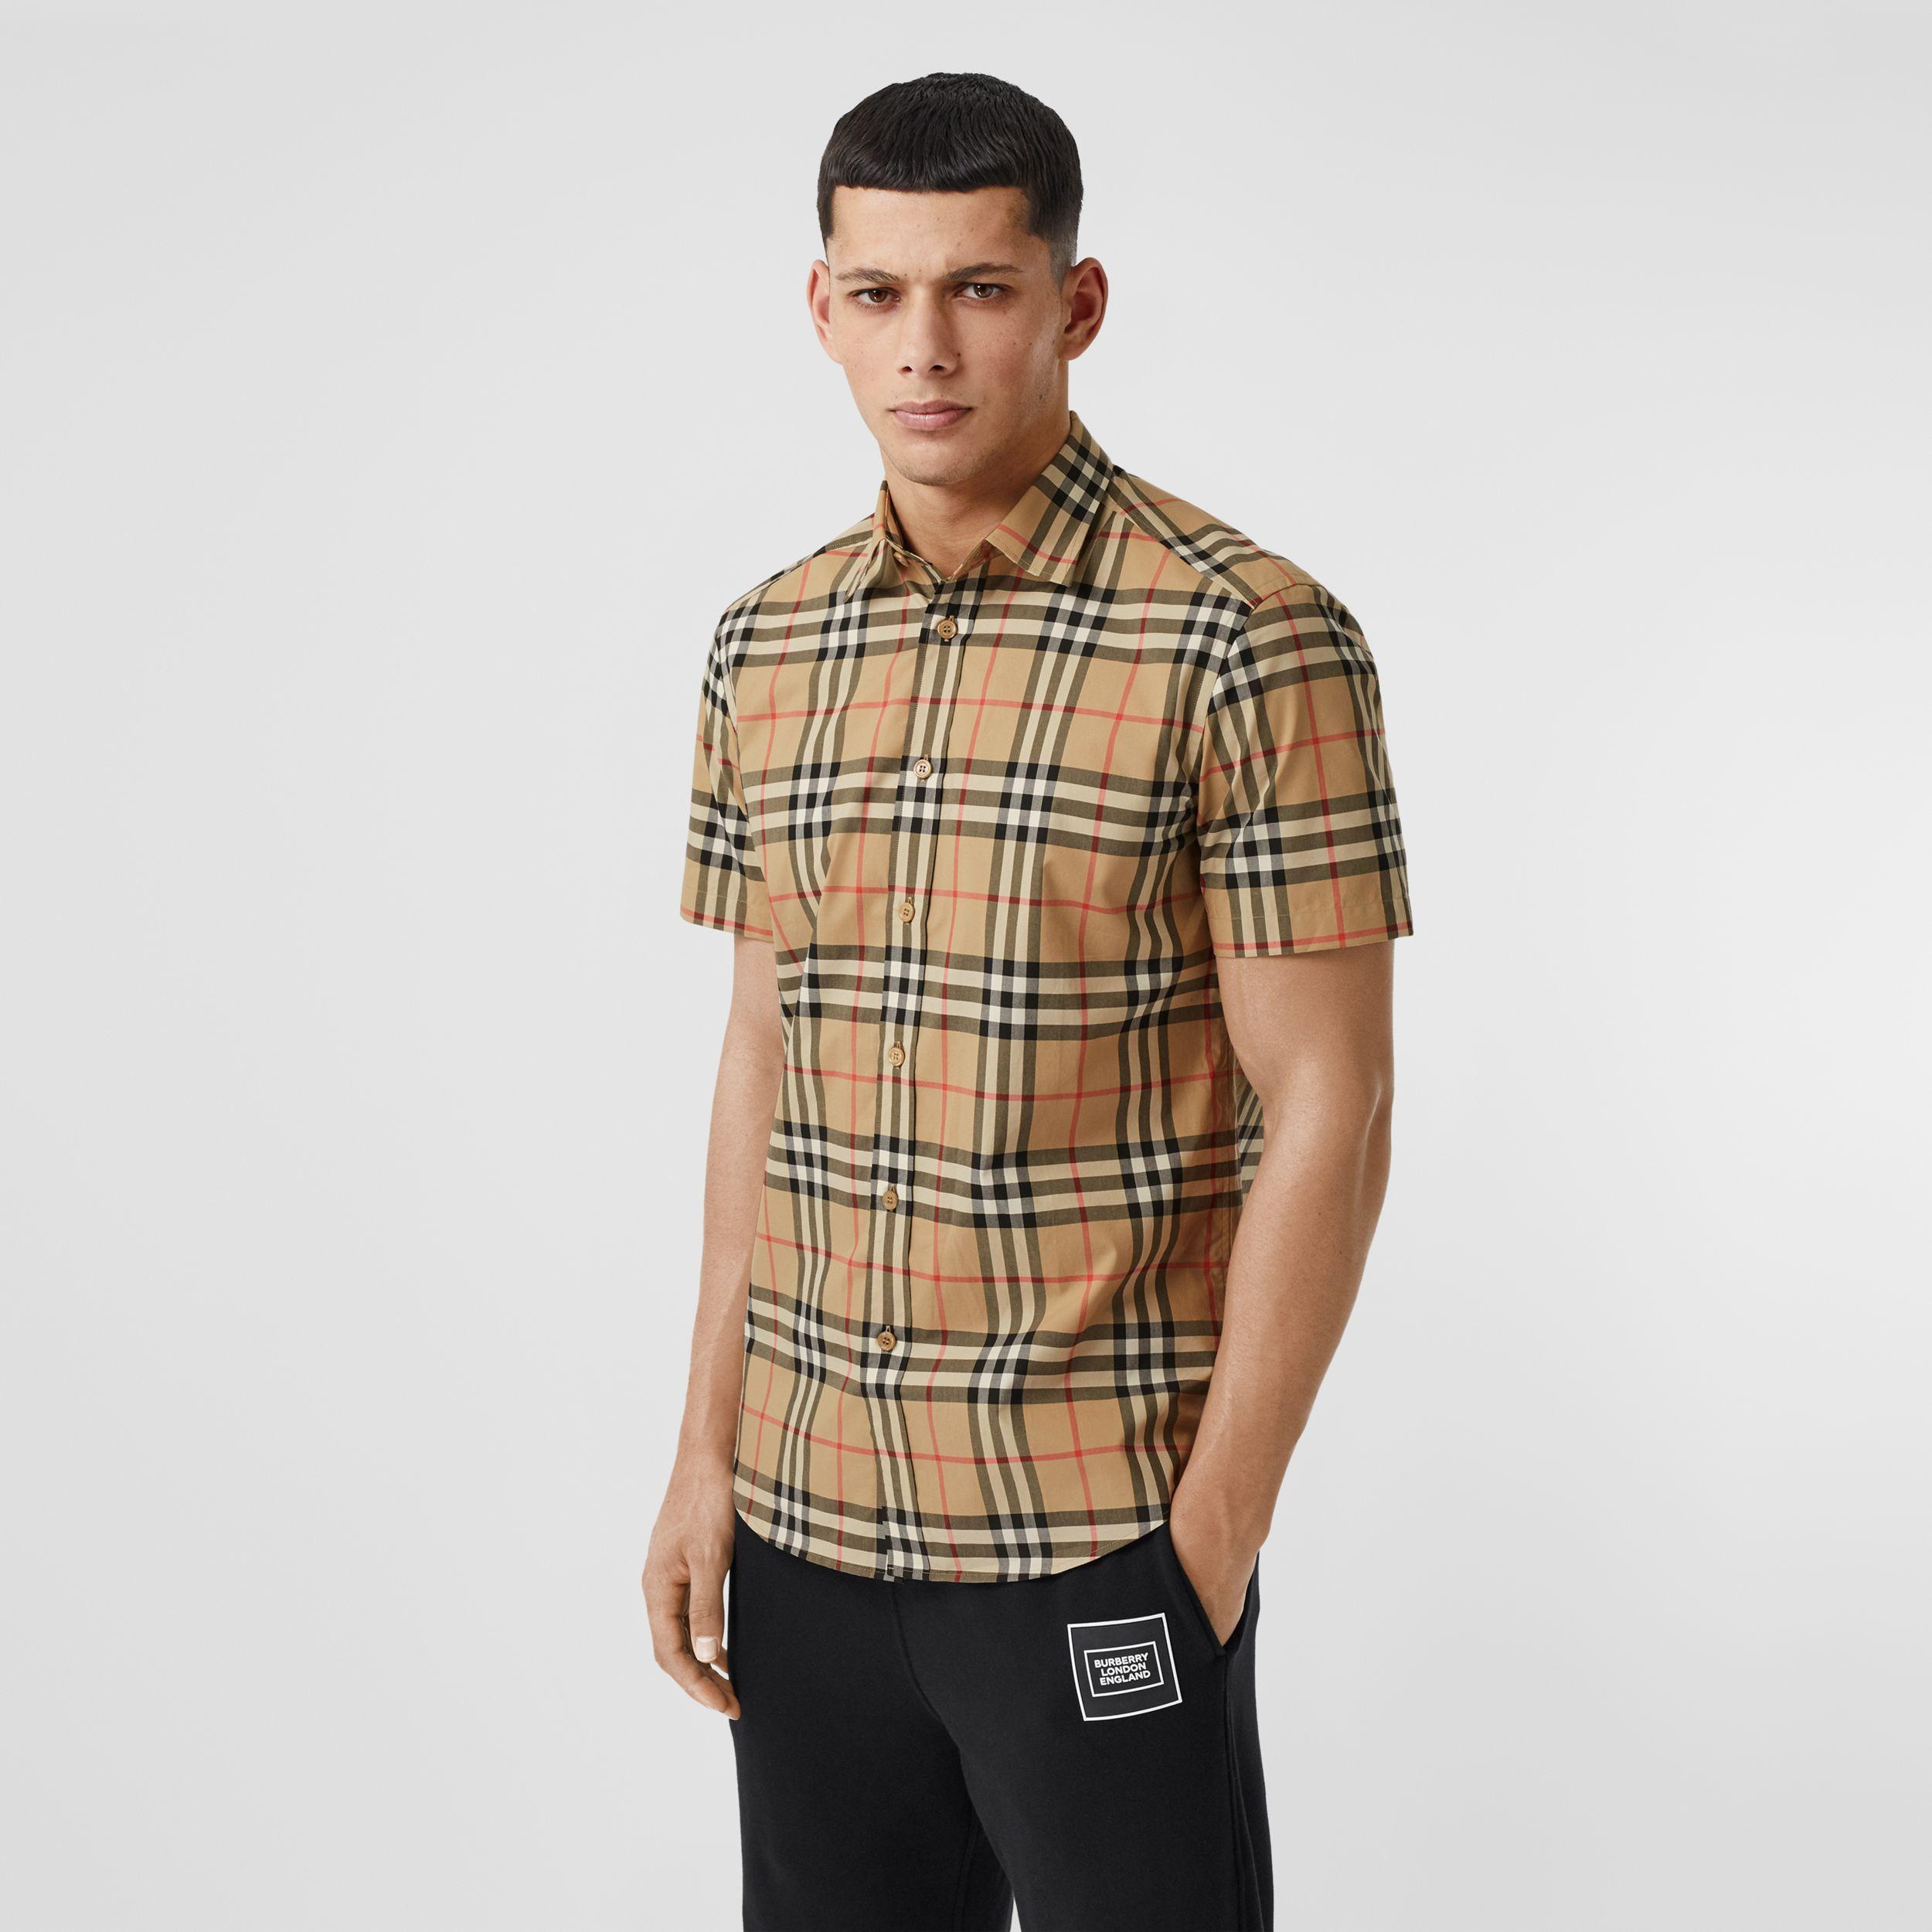 Burberry Shirt Men - The Perfect Fashion Statement